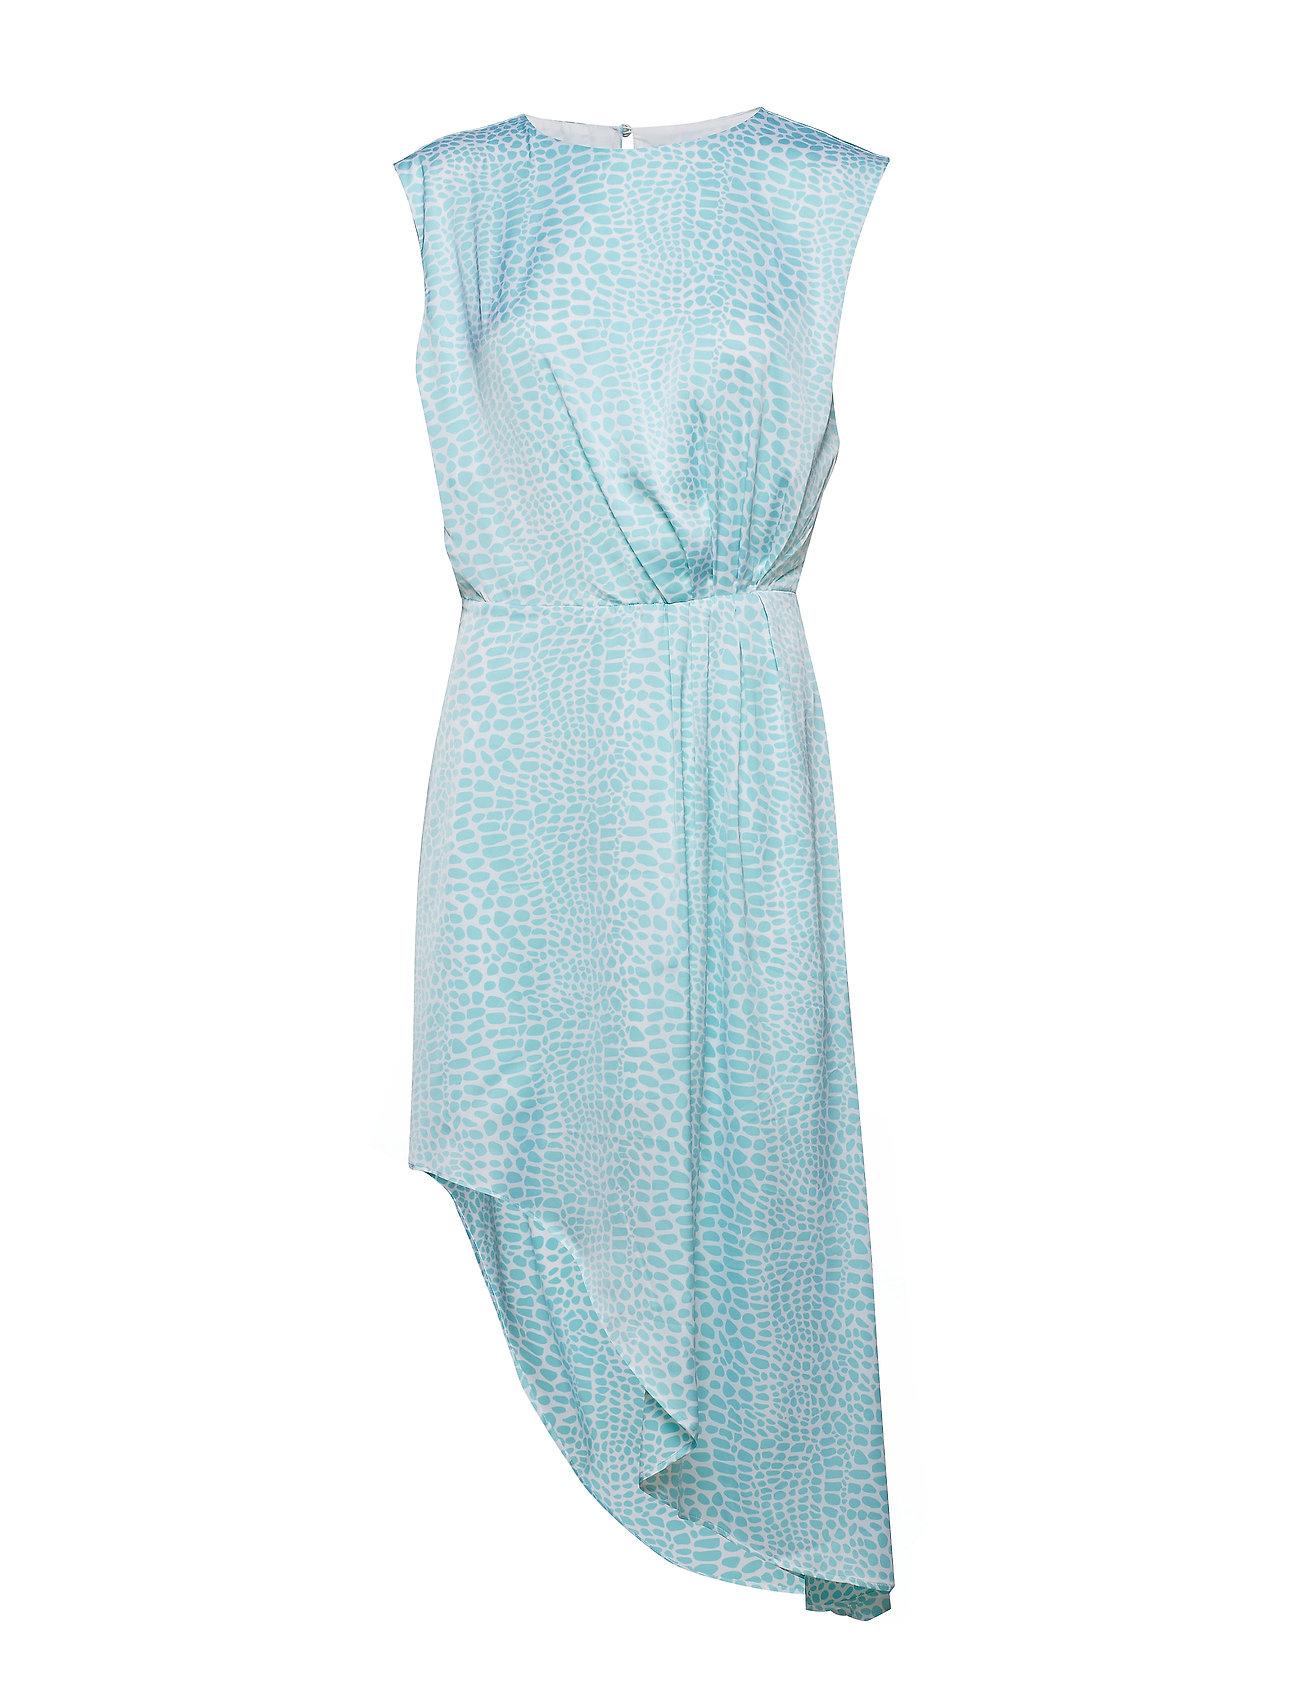 Ivyrevel Assymetric Dress - LIGHT BLUE CROCO PRINT